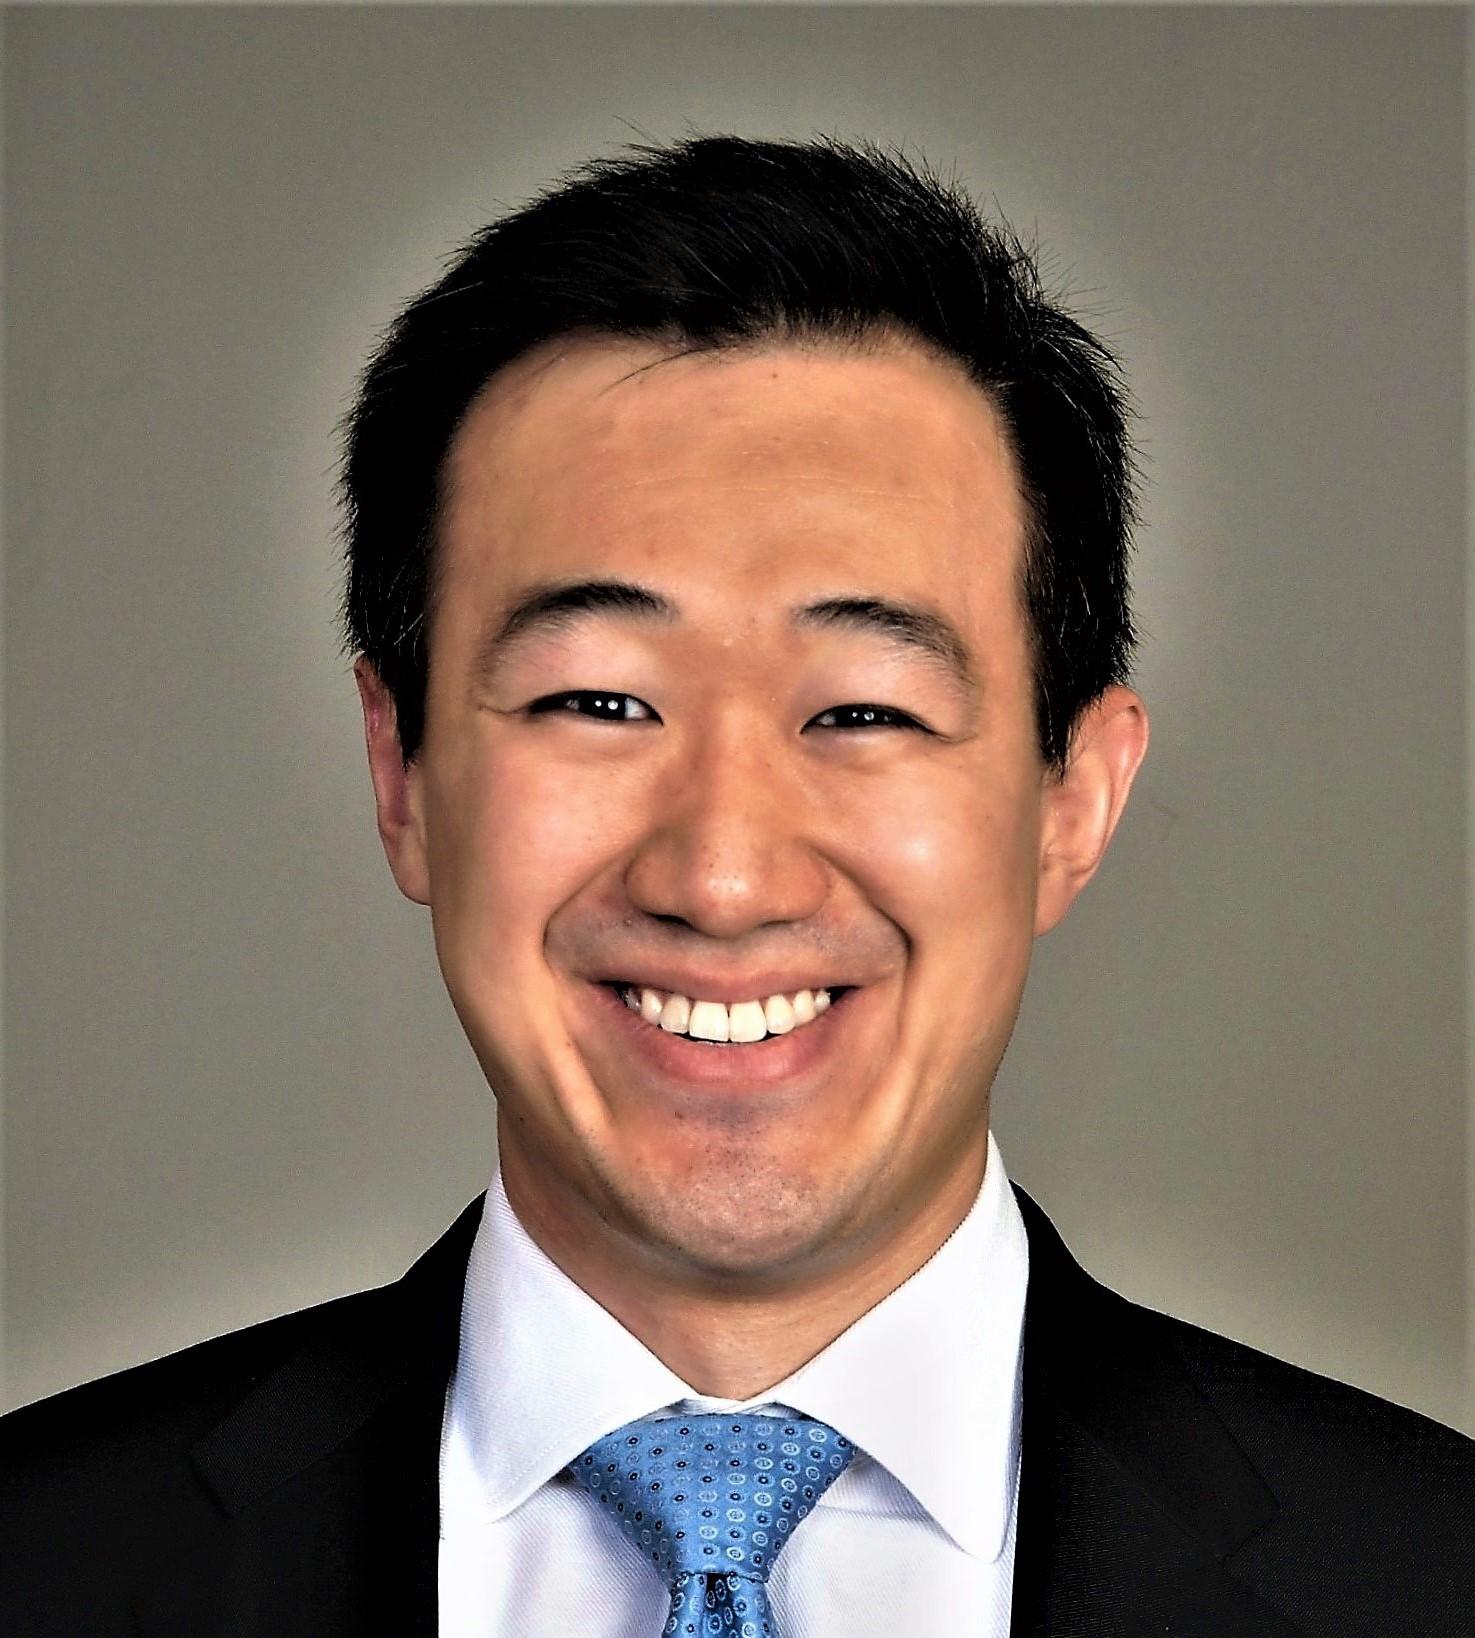 Terence Hu Profile Photo.jpg